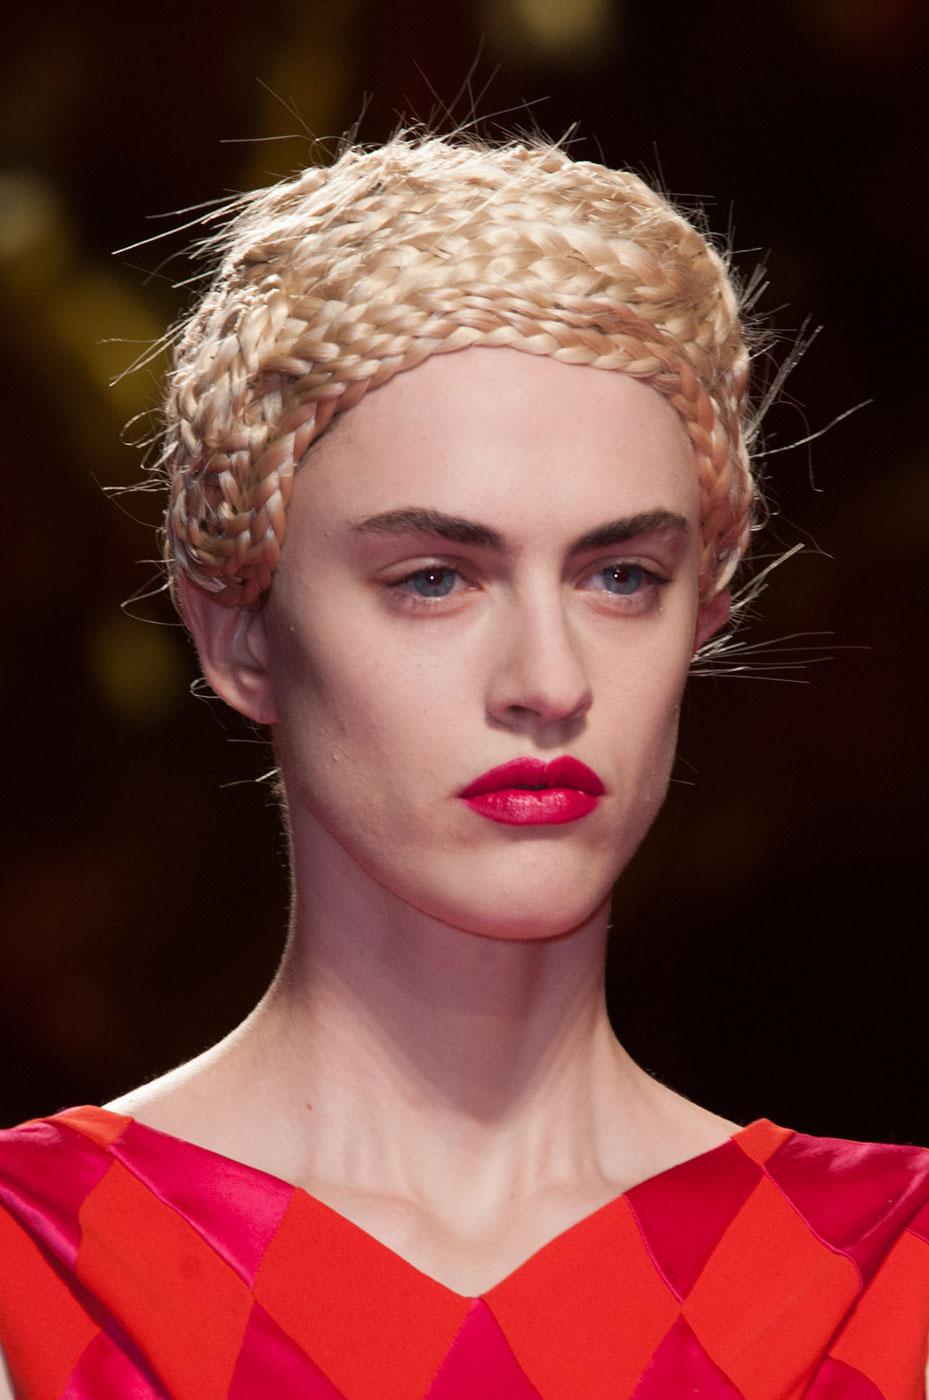 Schiaparelli-fashion-runway-show-close-ups-haute-couture-paris-spring-summer-2015-the-impression-33